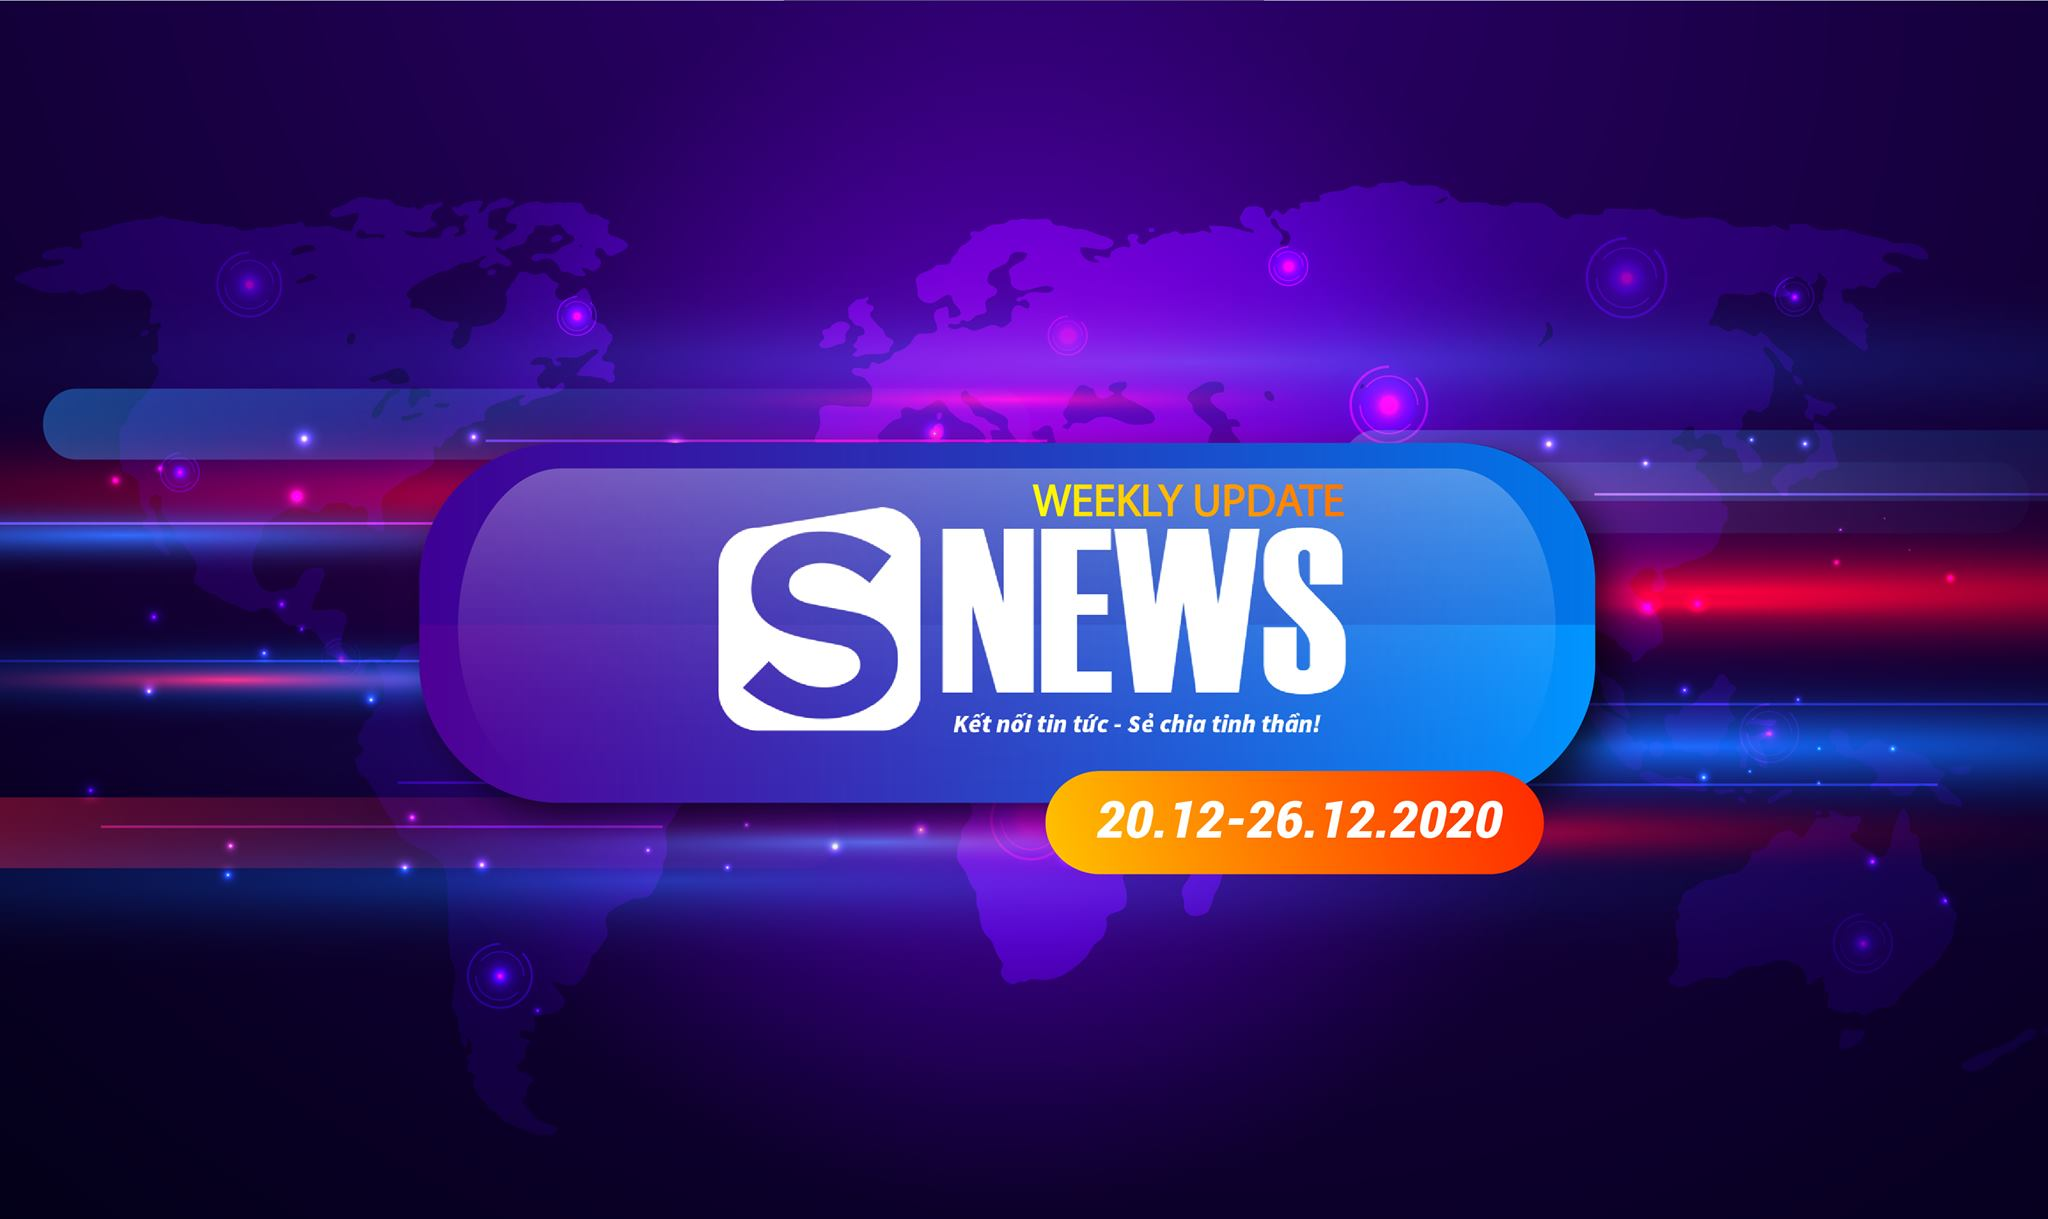 Tổng hợp tin tức Sapo tuần qua: 20.12 - 26.12.2020